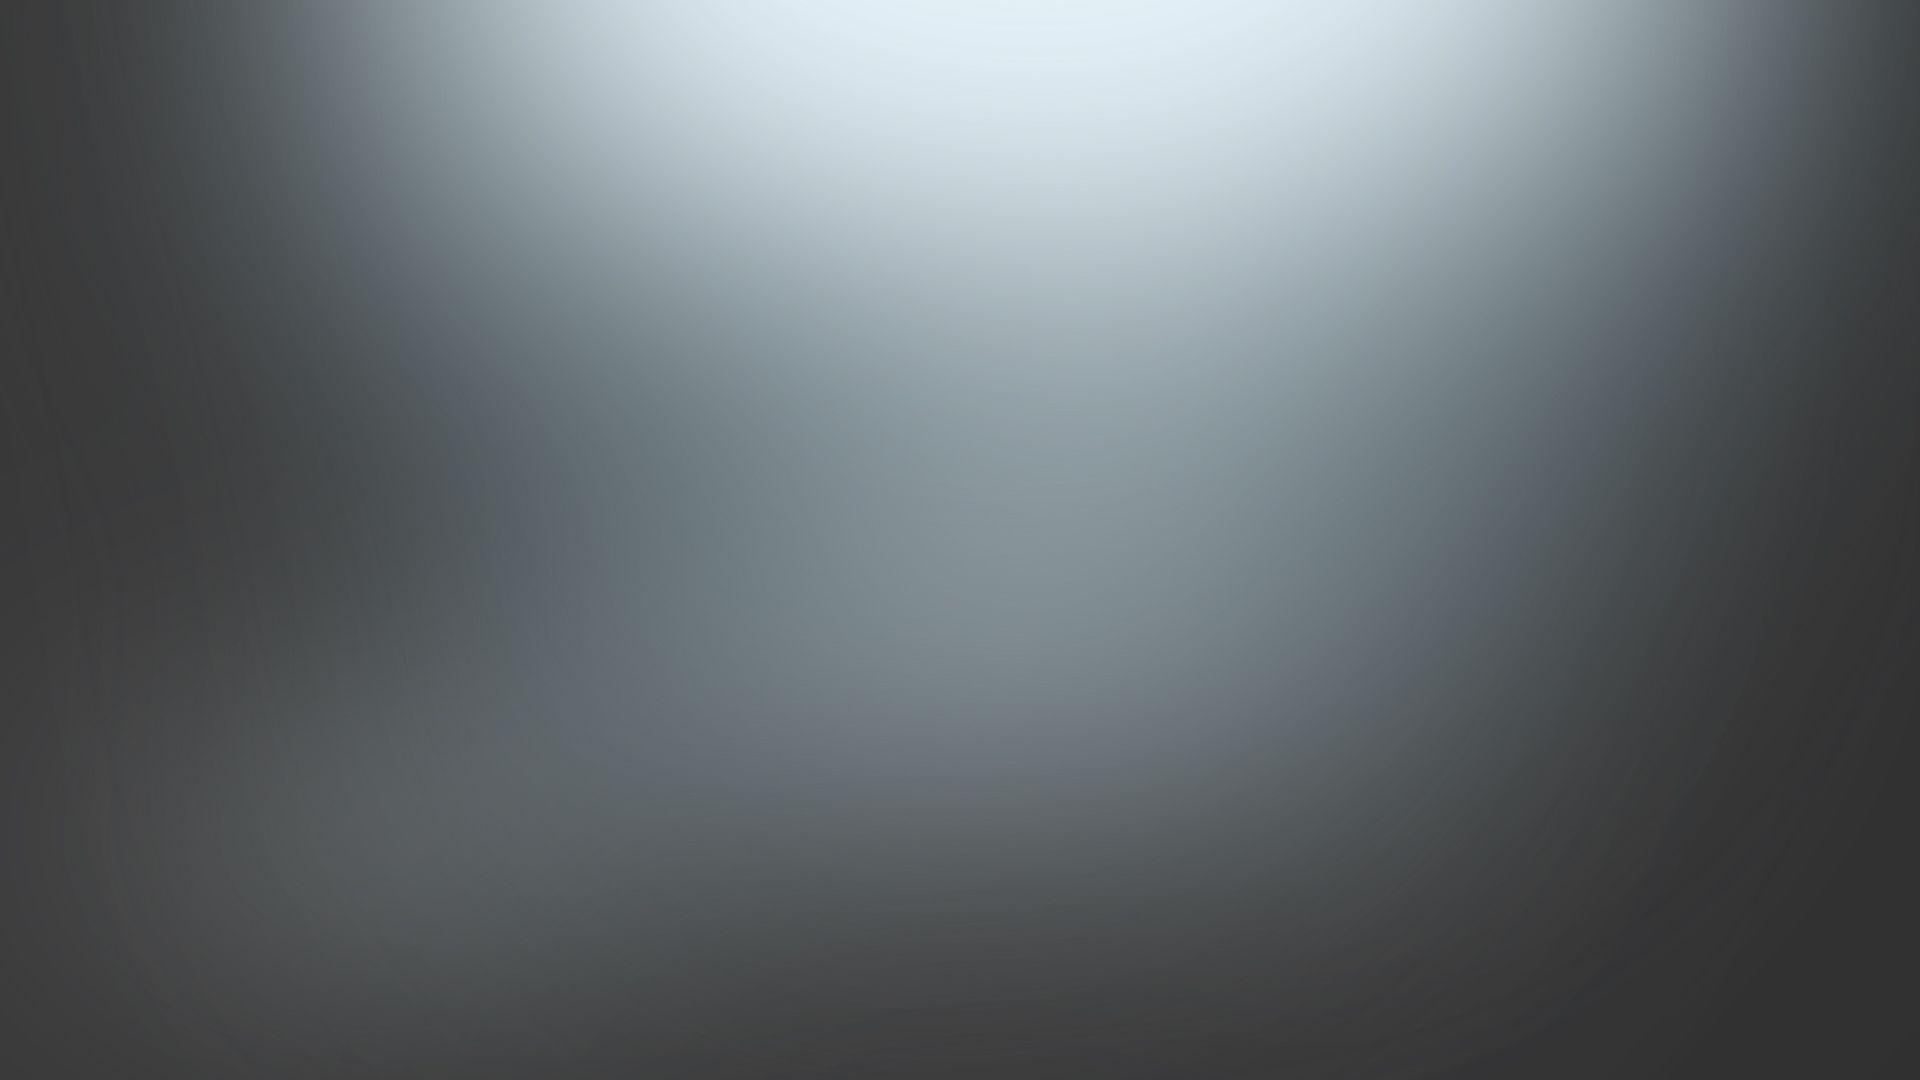 Light Grey free hd wallpaper